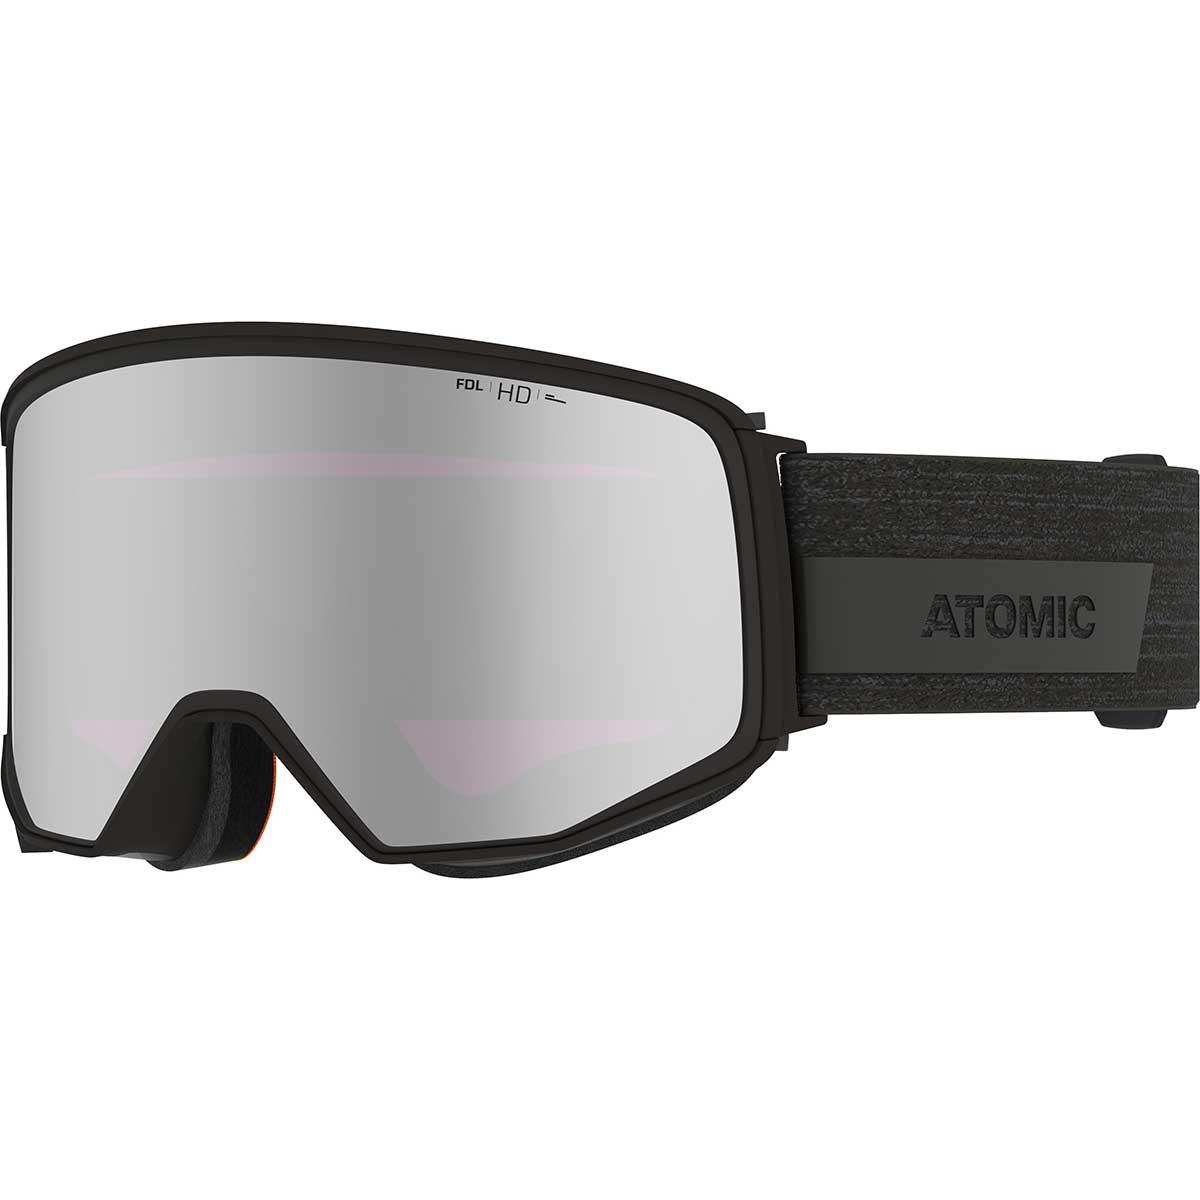 Atomic Four Q HD Goggles